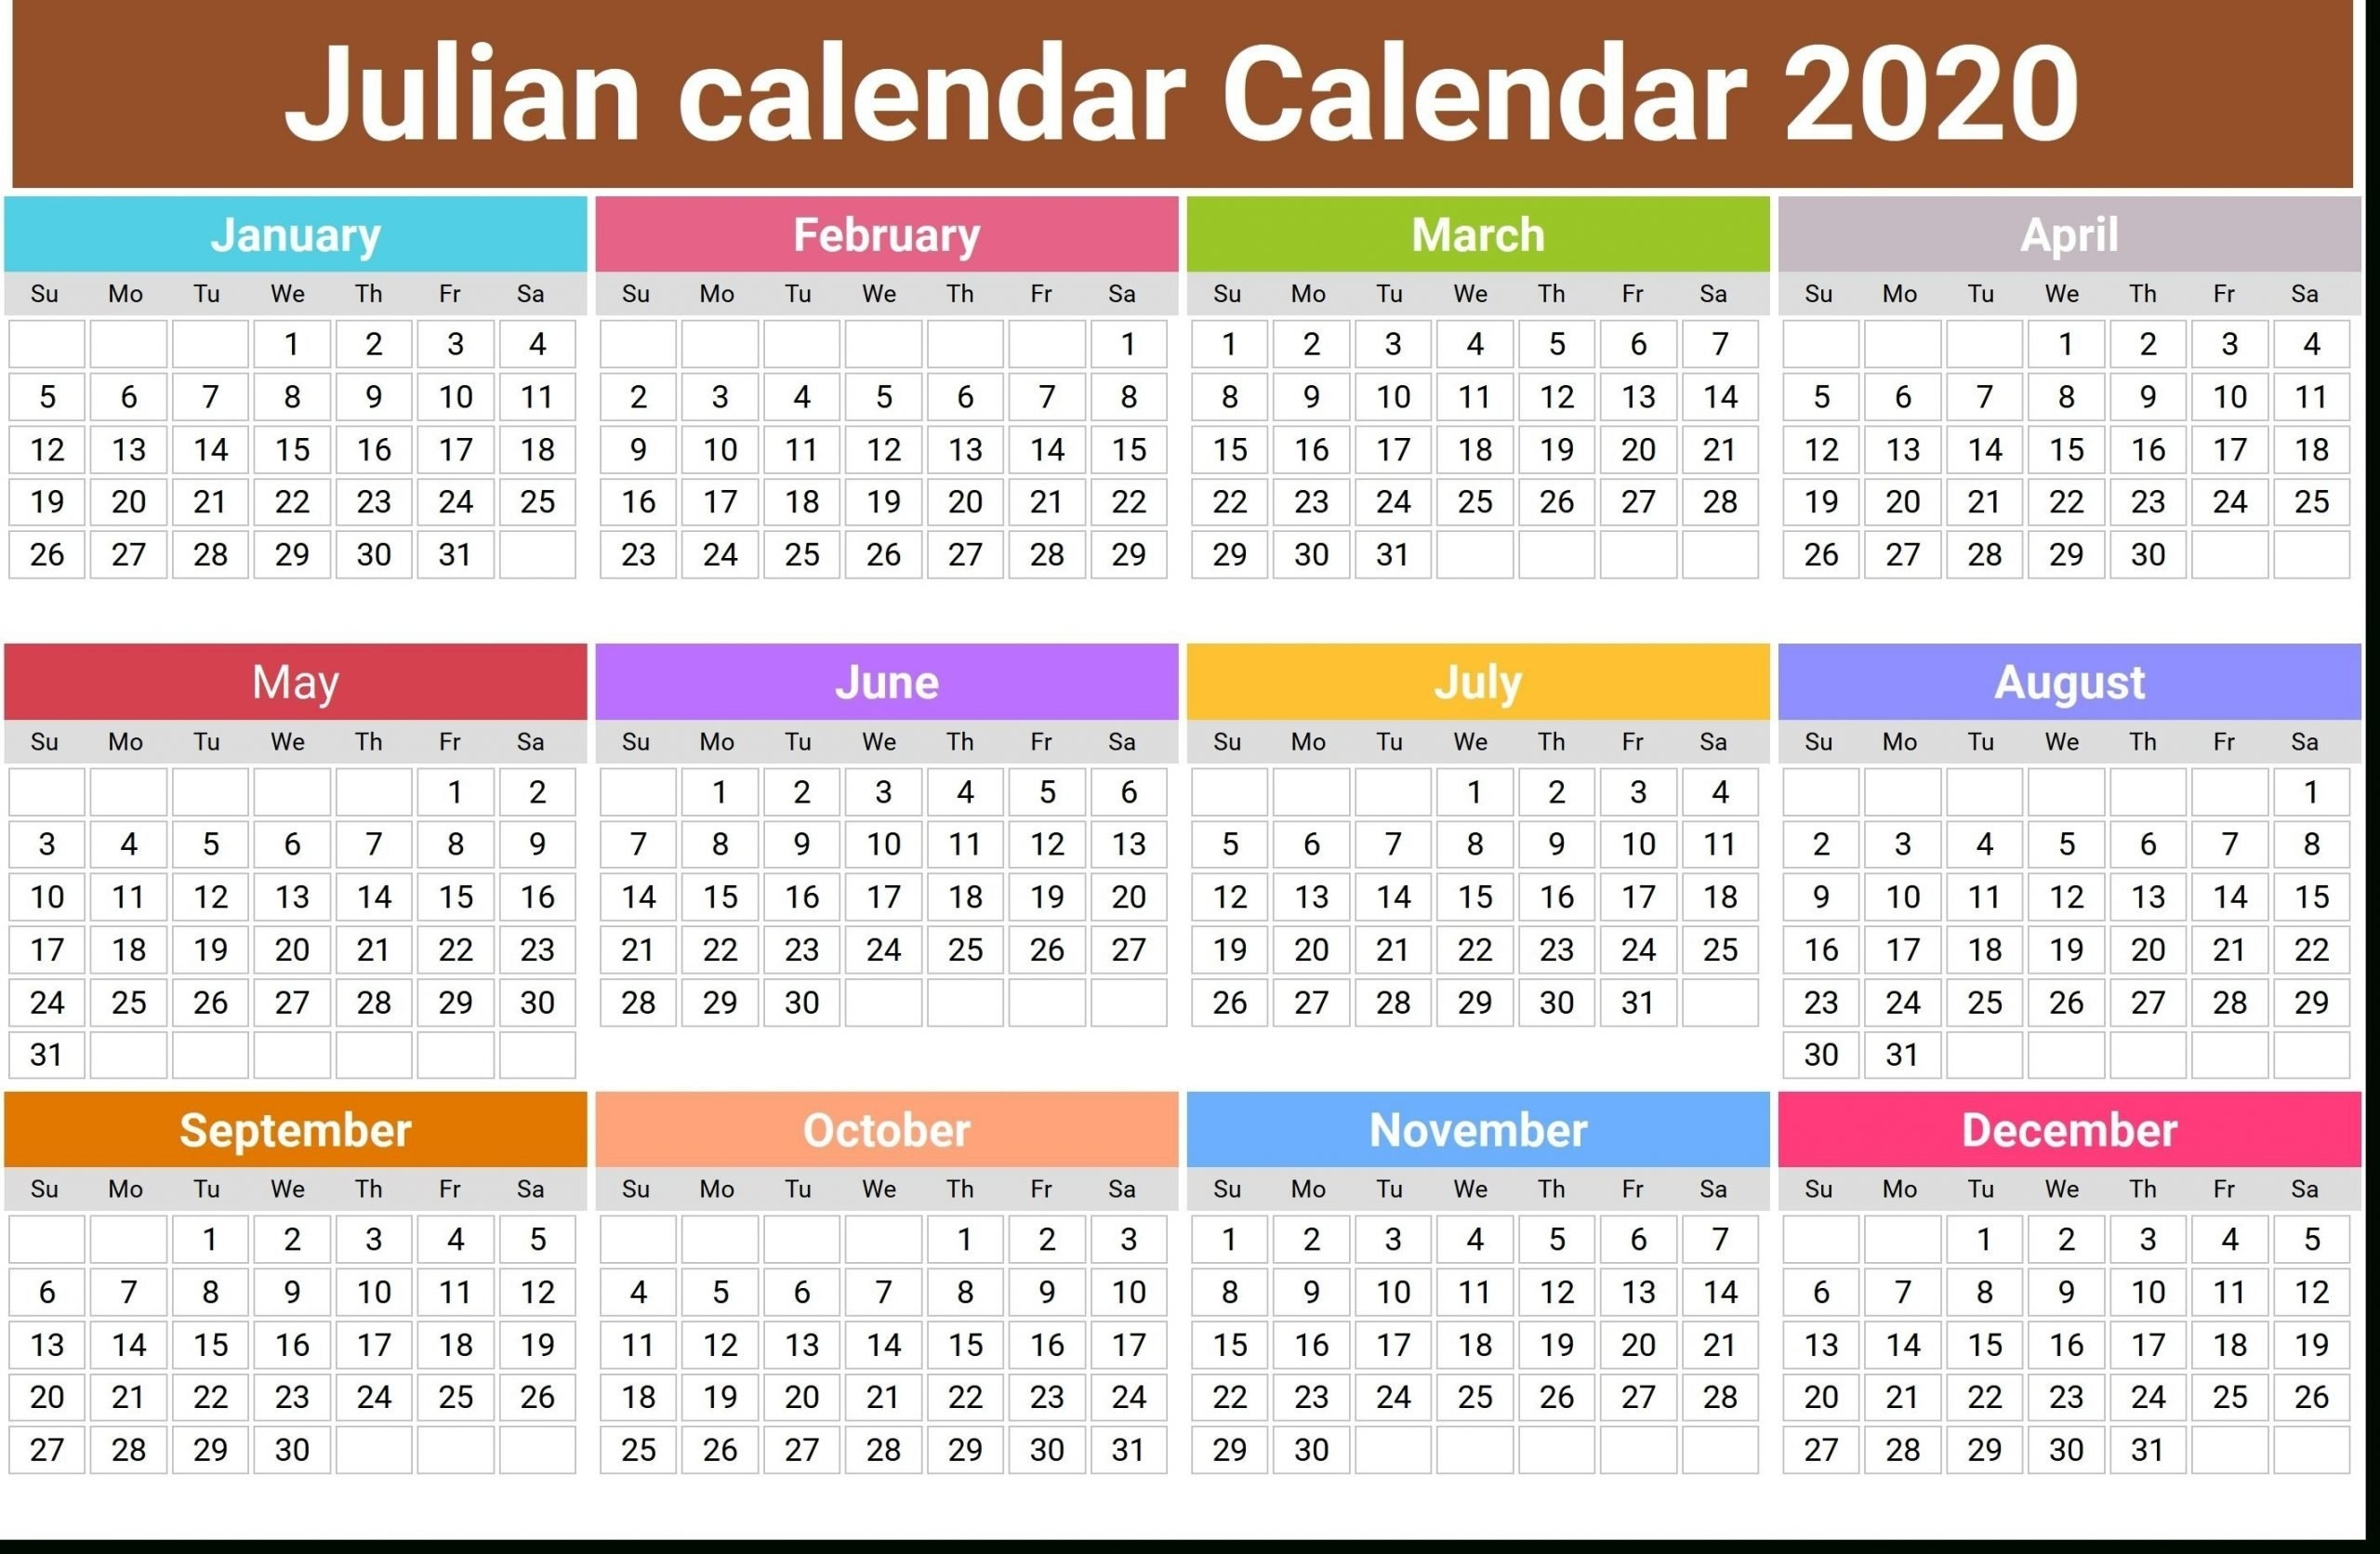 Weekly Calendar Time Slots Printable - Template Calendar Design regarding Julian Date Calendar For Year 2021